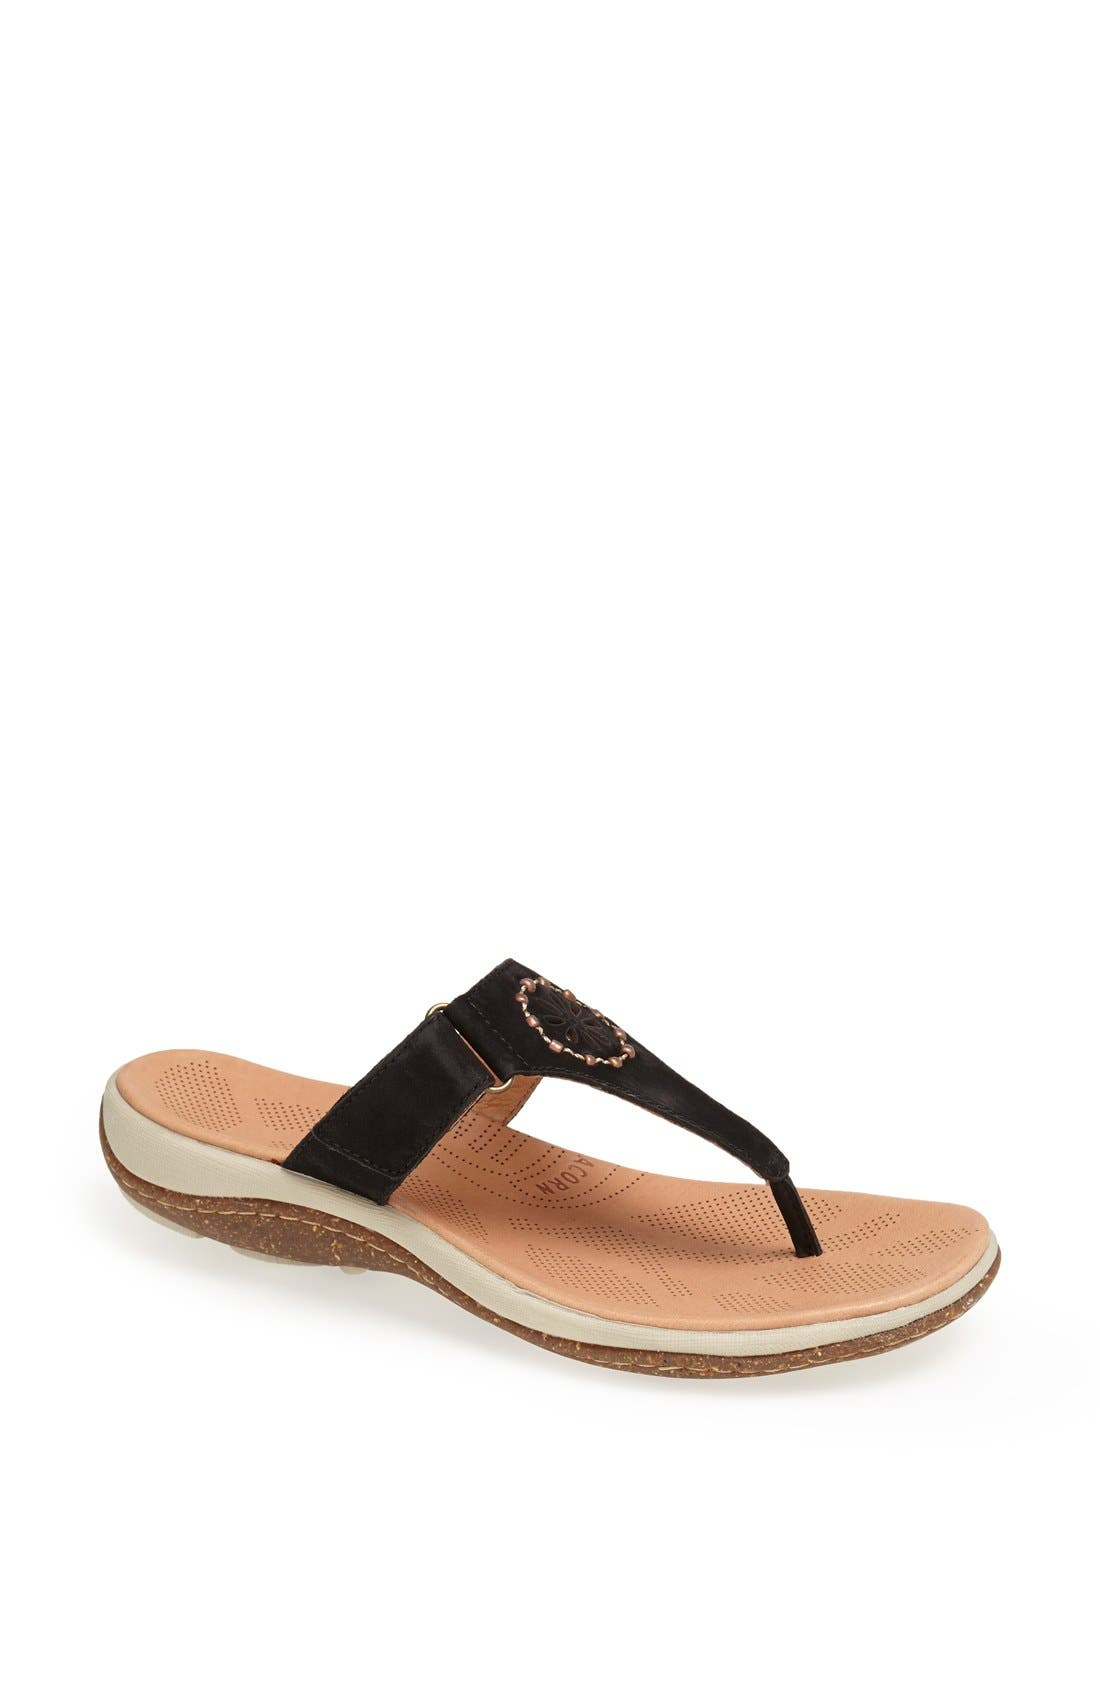 Main Image - Acorn 'Vista' Beaded Thong Sandal